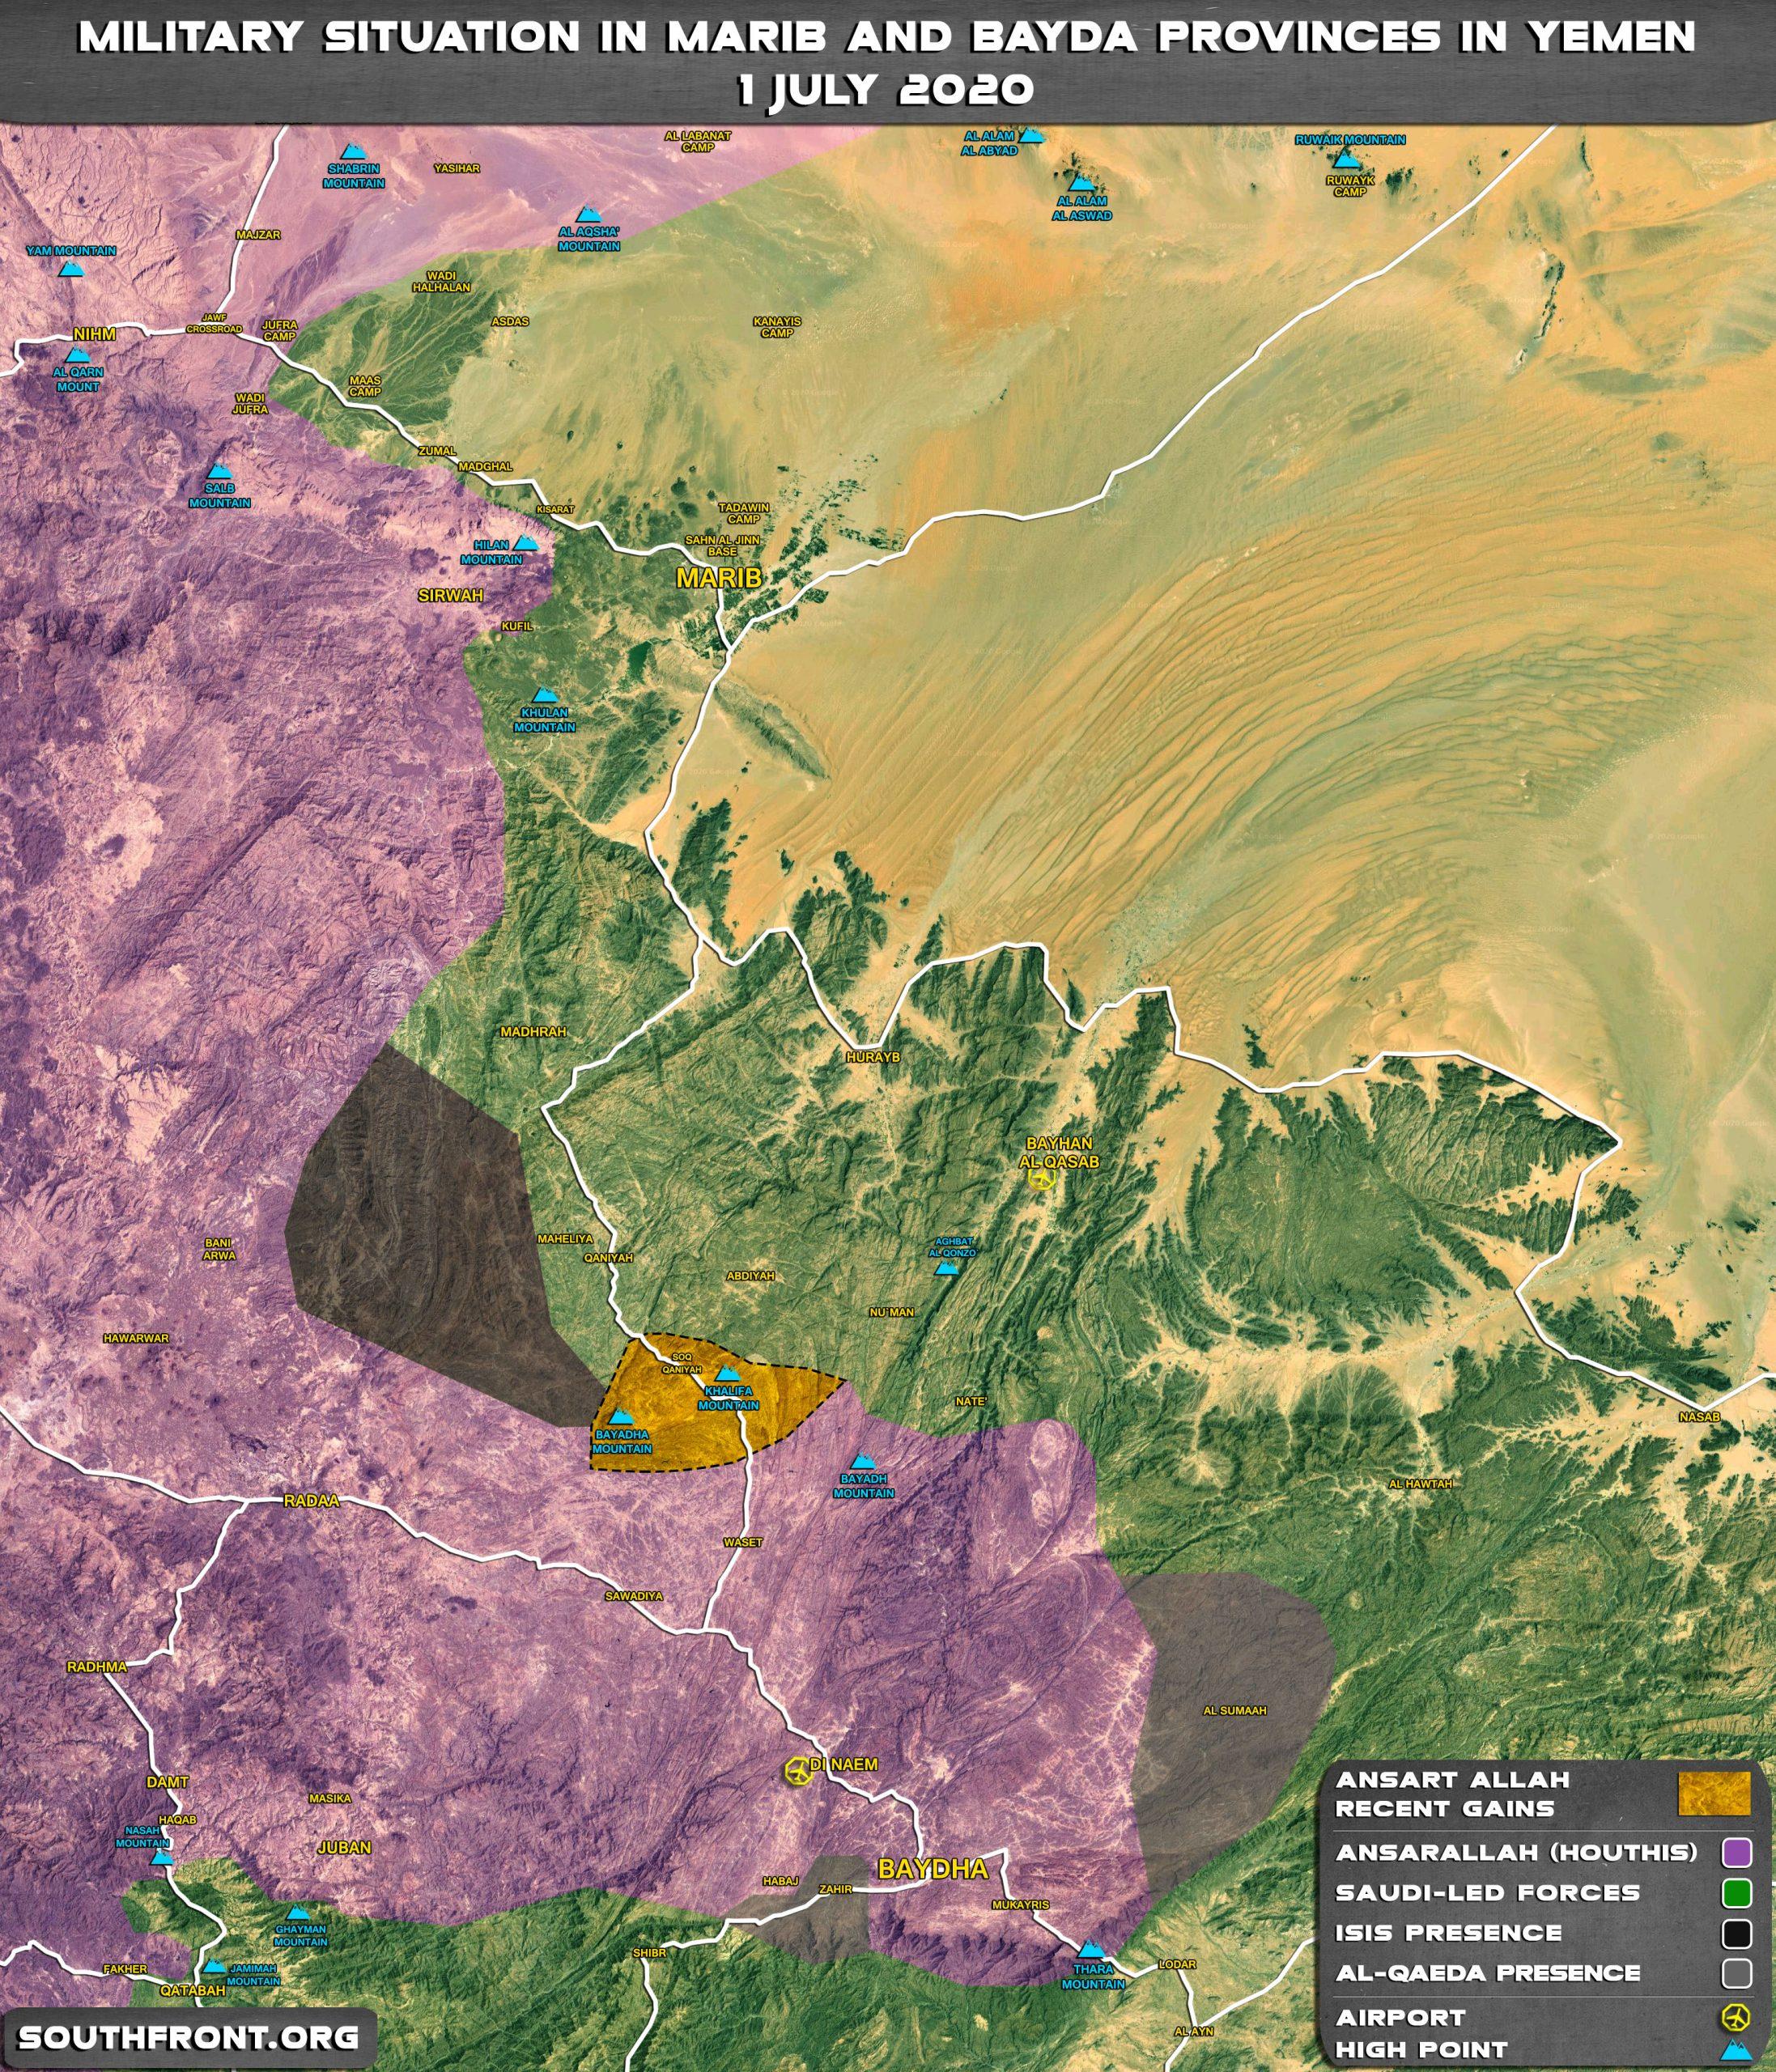 Map Update: Ansar Allah gains In Yemeni Provinces Of Marib And Bayda